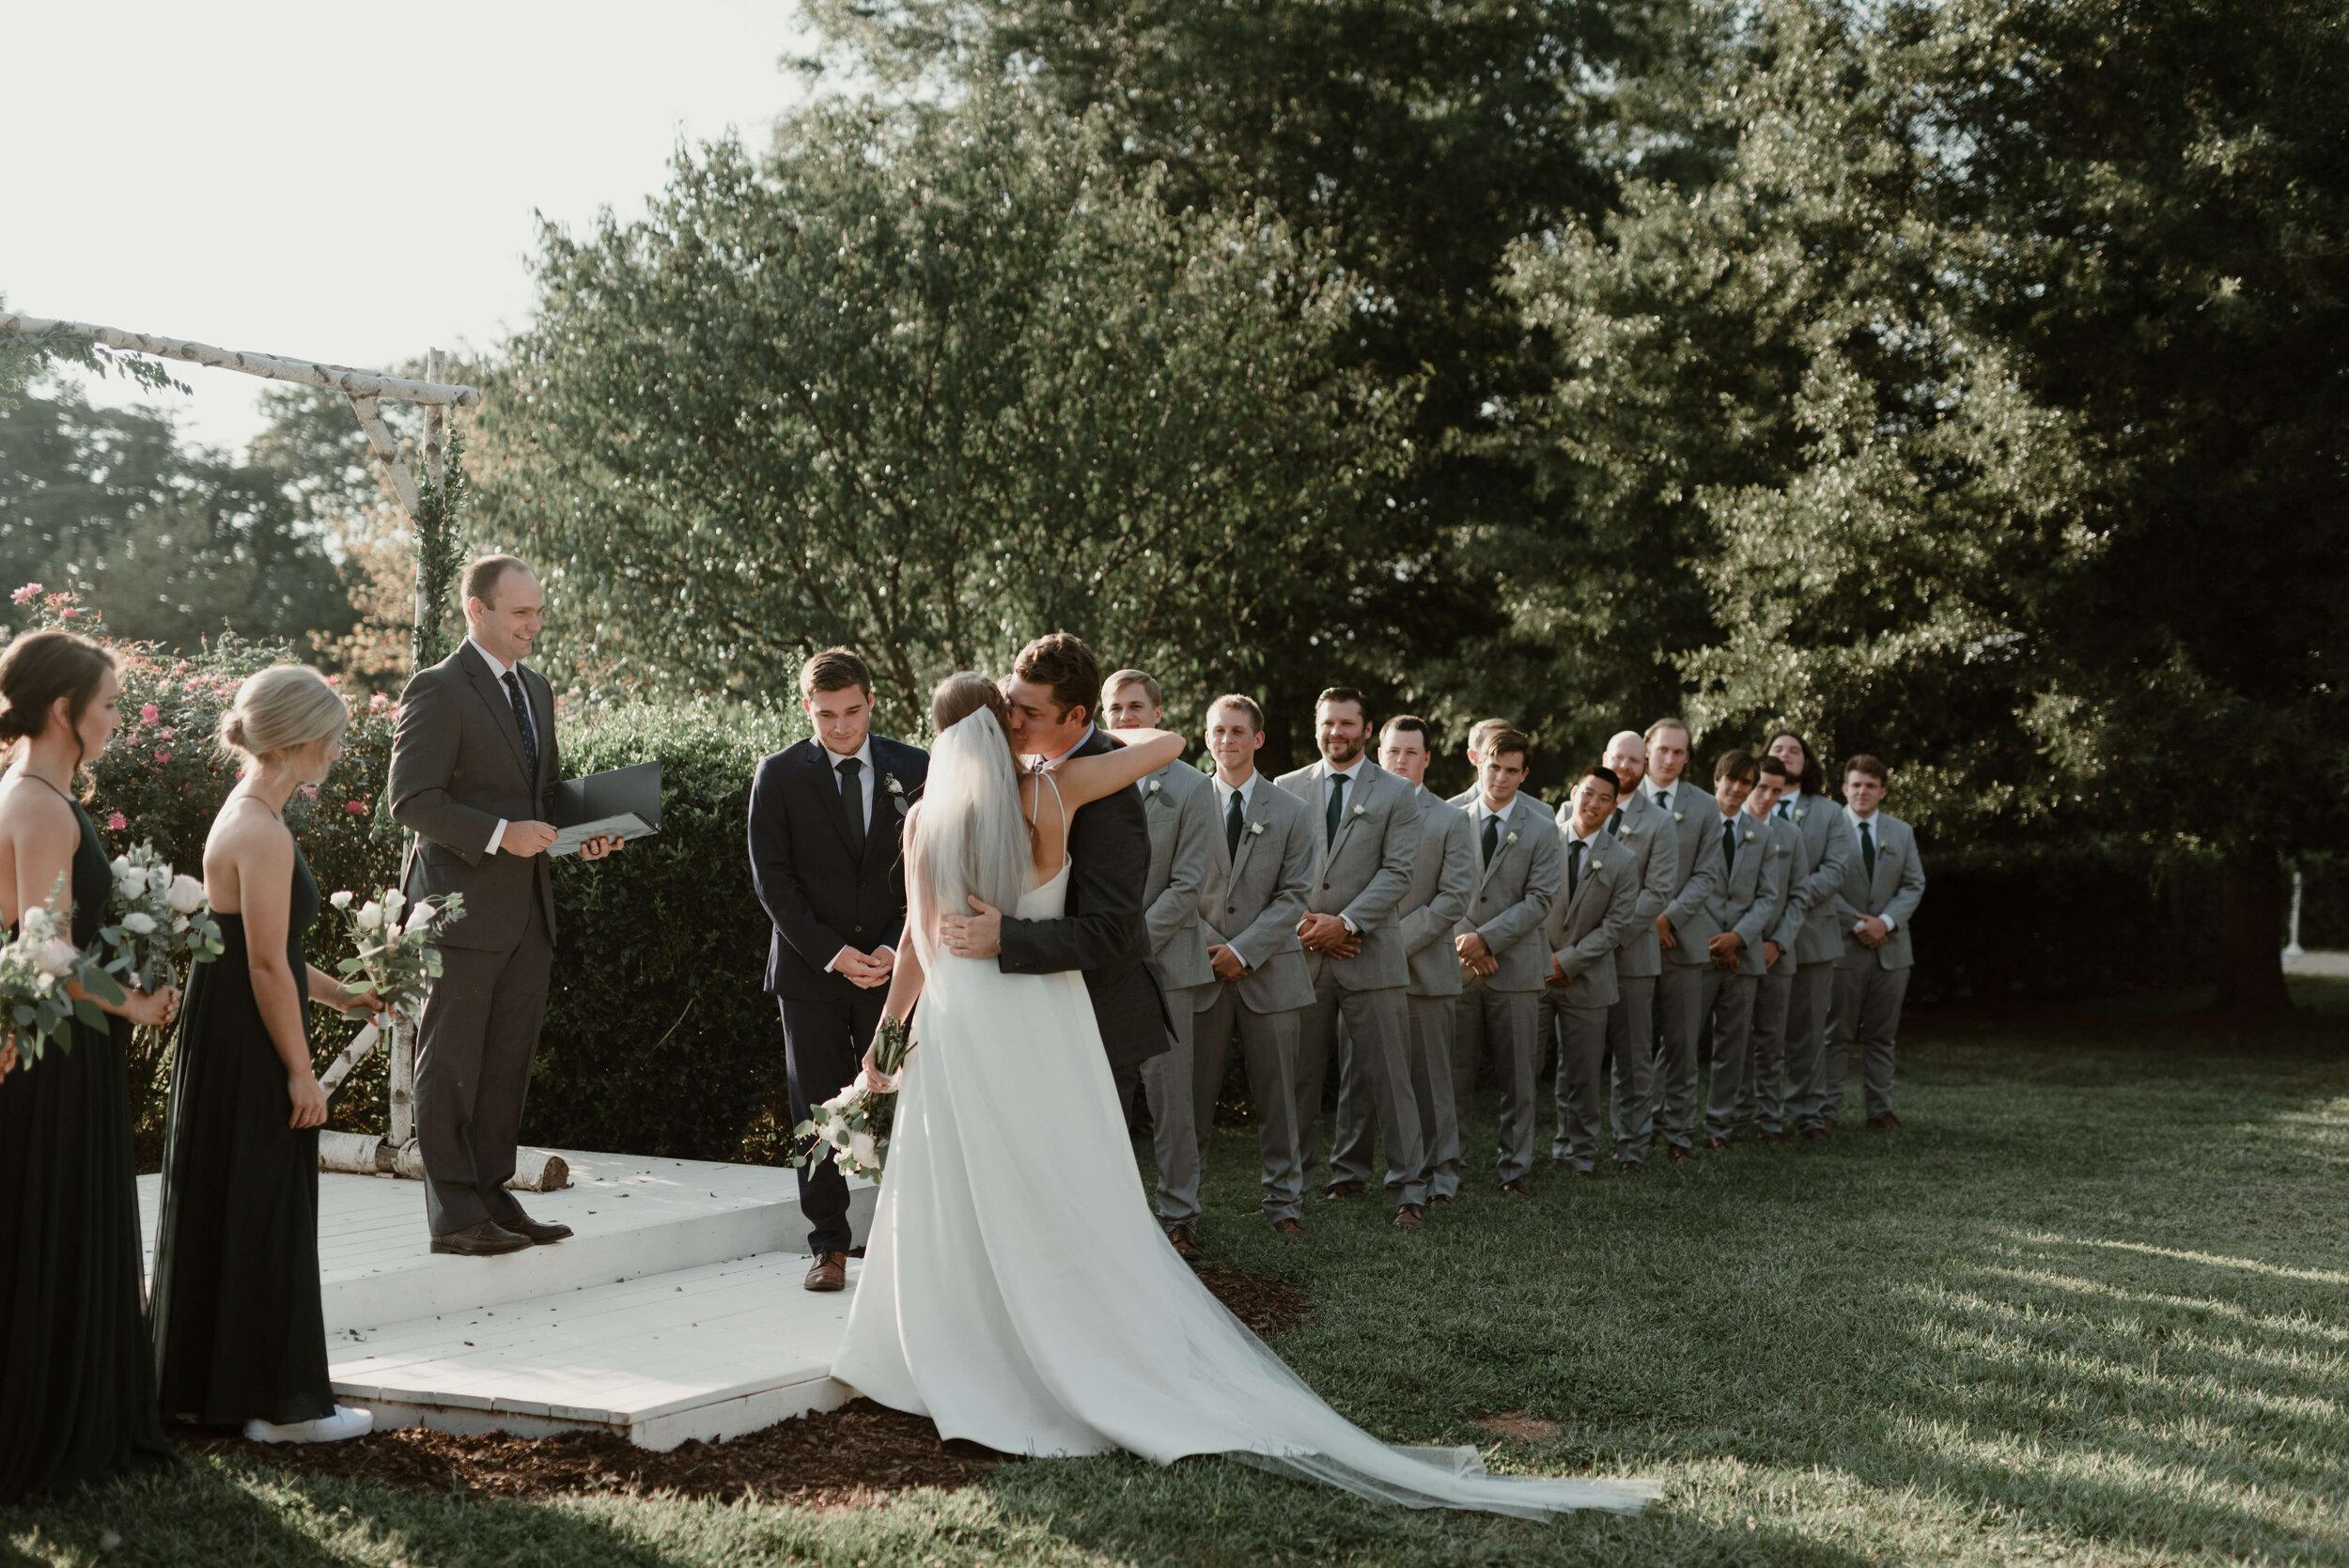 RALEIGH_WEDDING_GABBY_AND_SMITTYDSC_7674.jpg